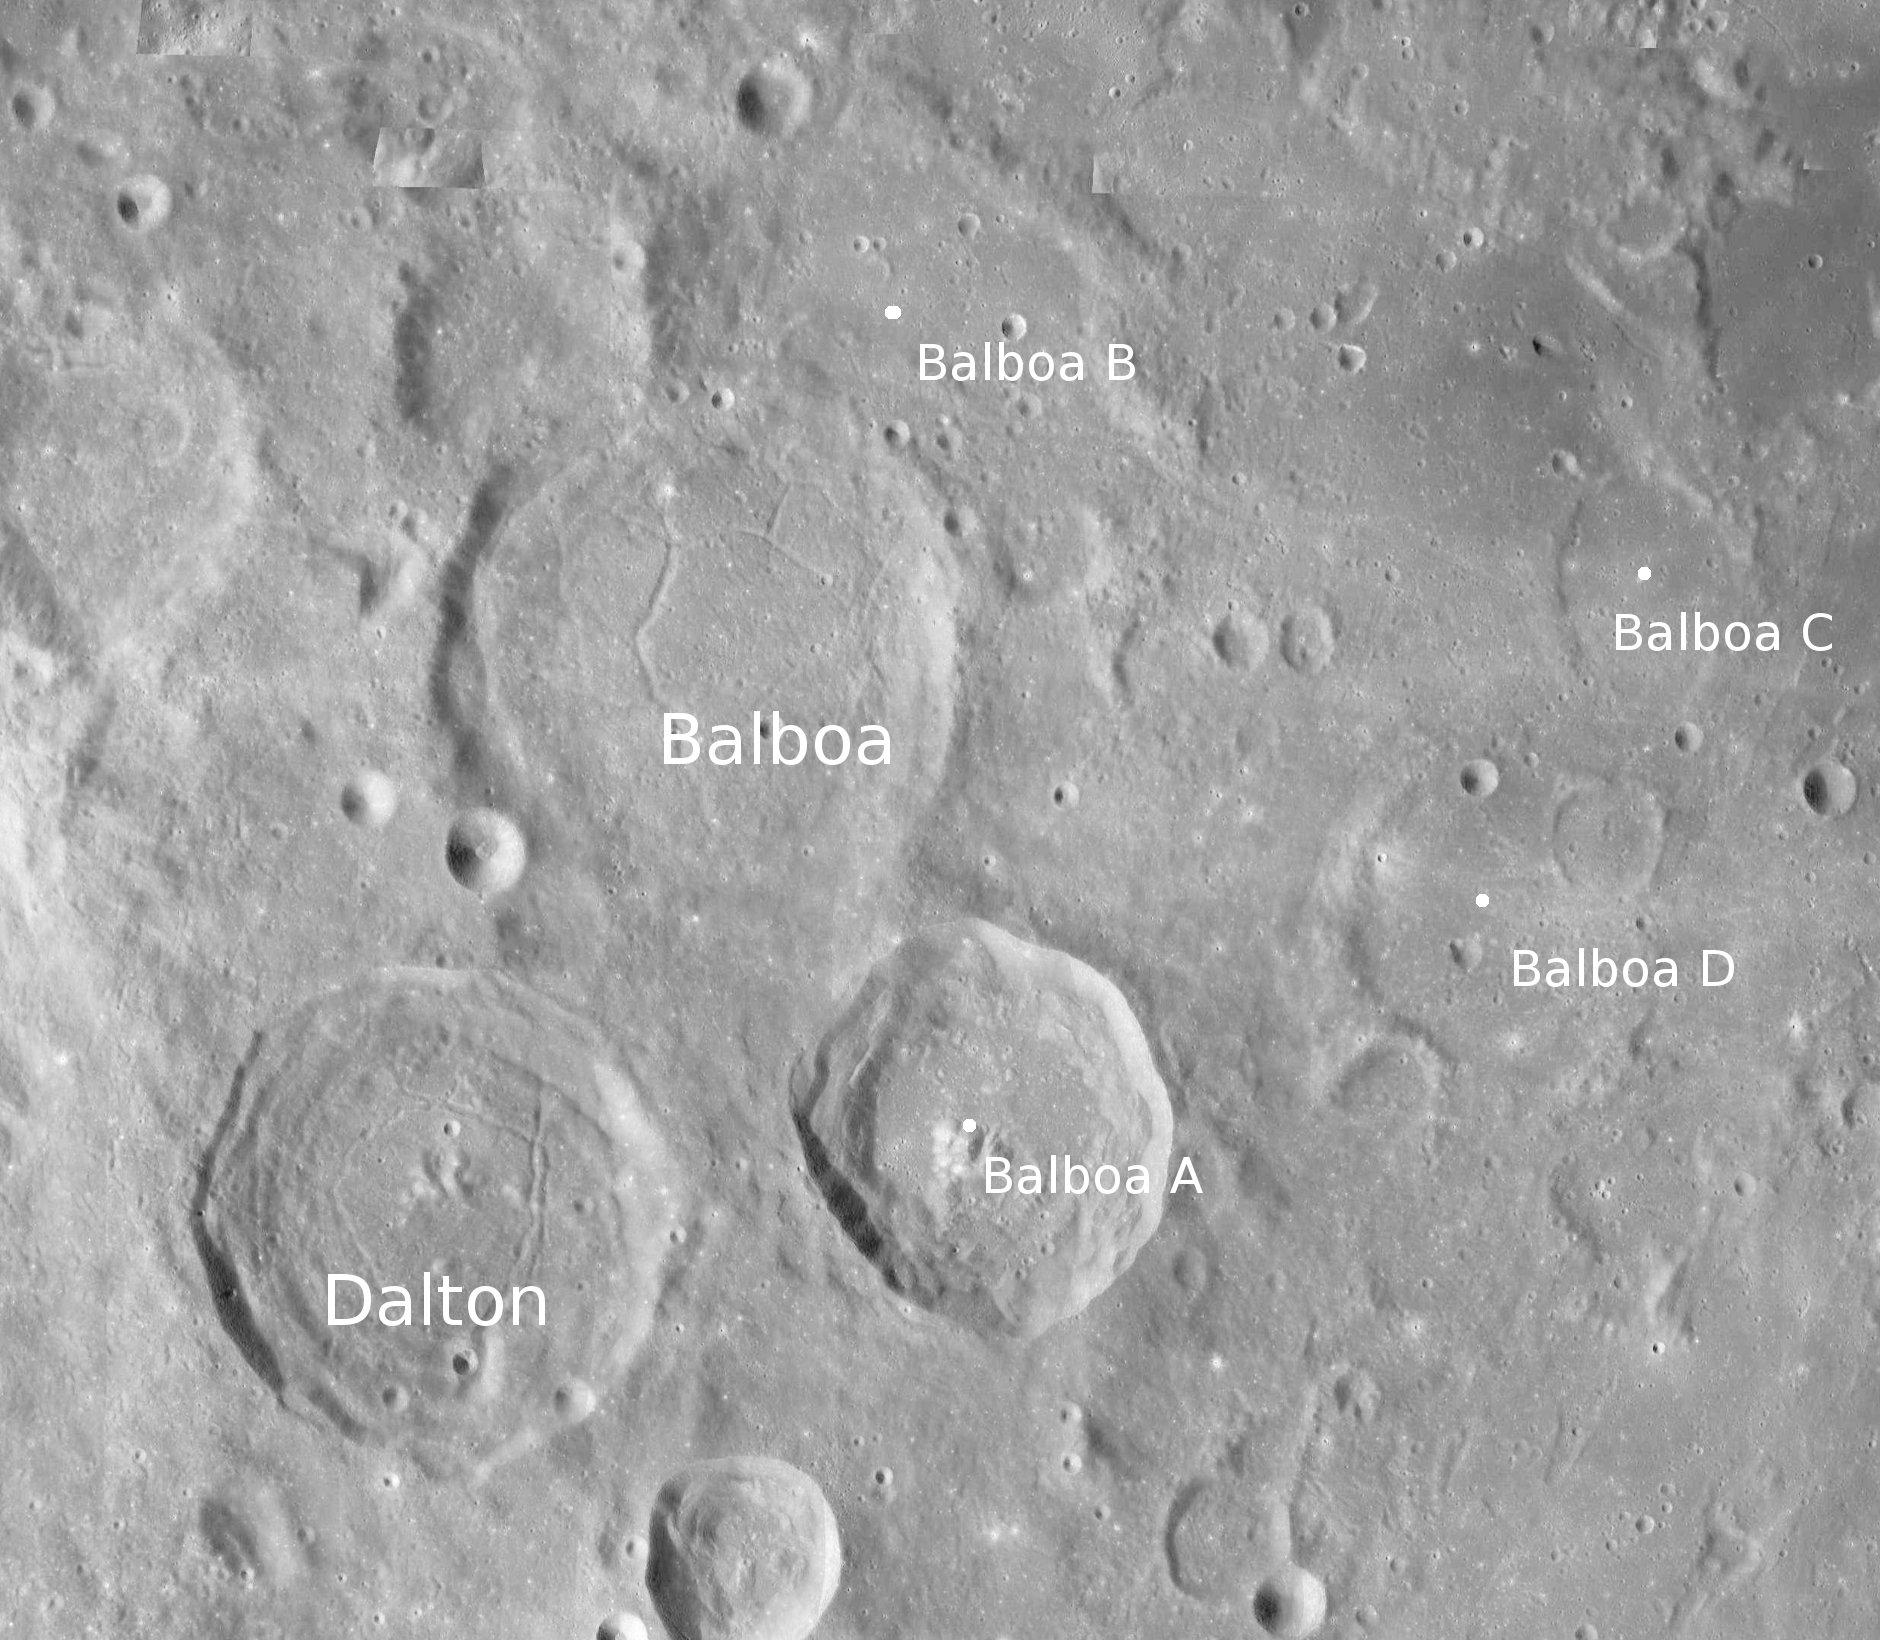 Balboa + Dalton - LROC - WAC.JPG